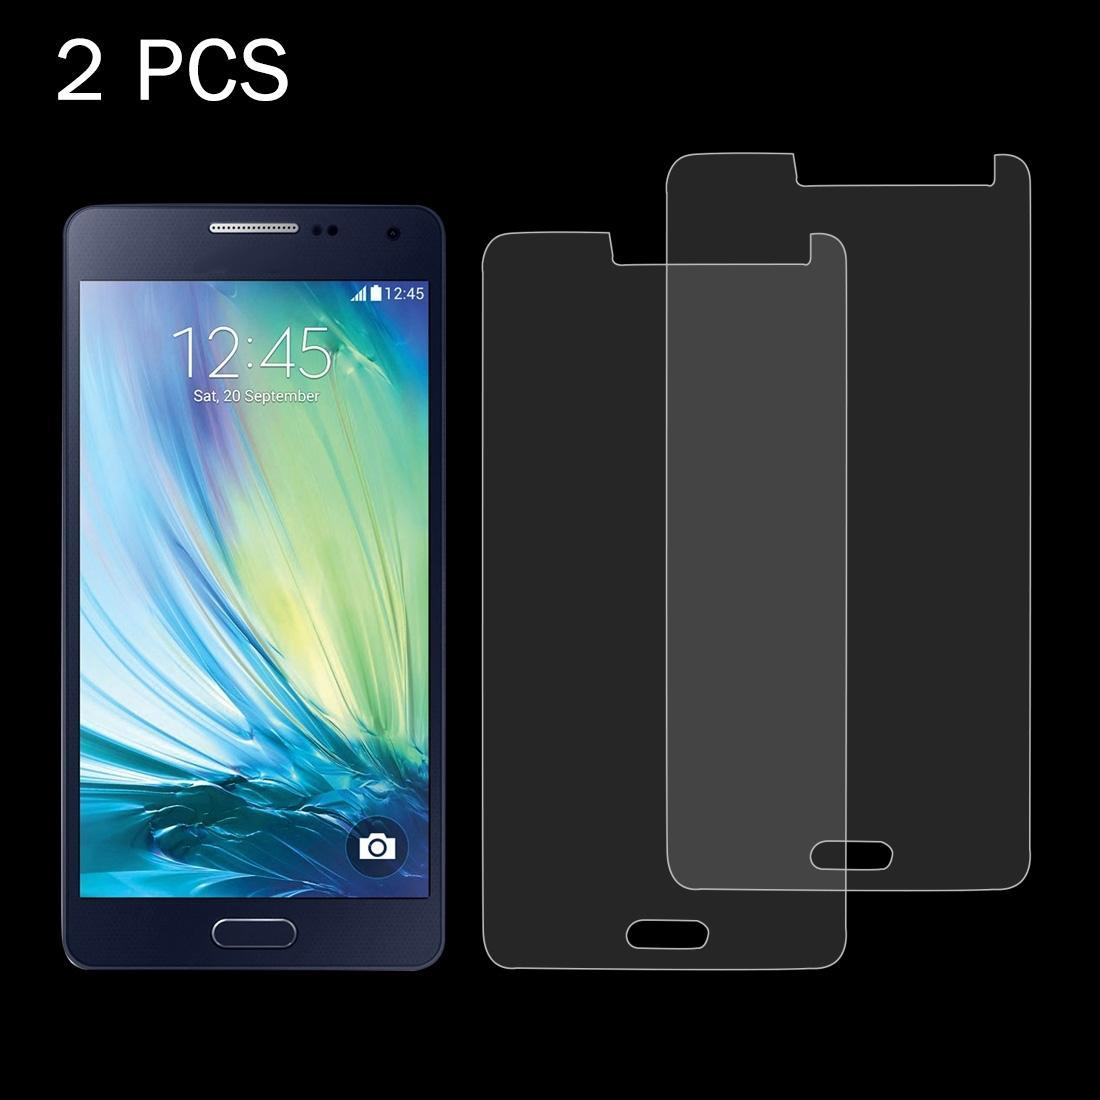 2 PCS para Galaxy A5 0.26mm 9H Dureza superficial 2.5D a prueba de explosiones de la pantalla de cristal templado de Cine